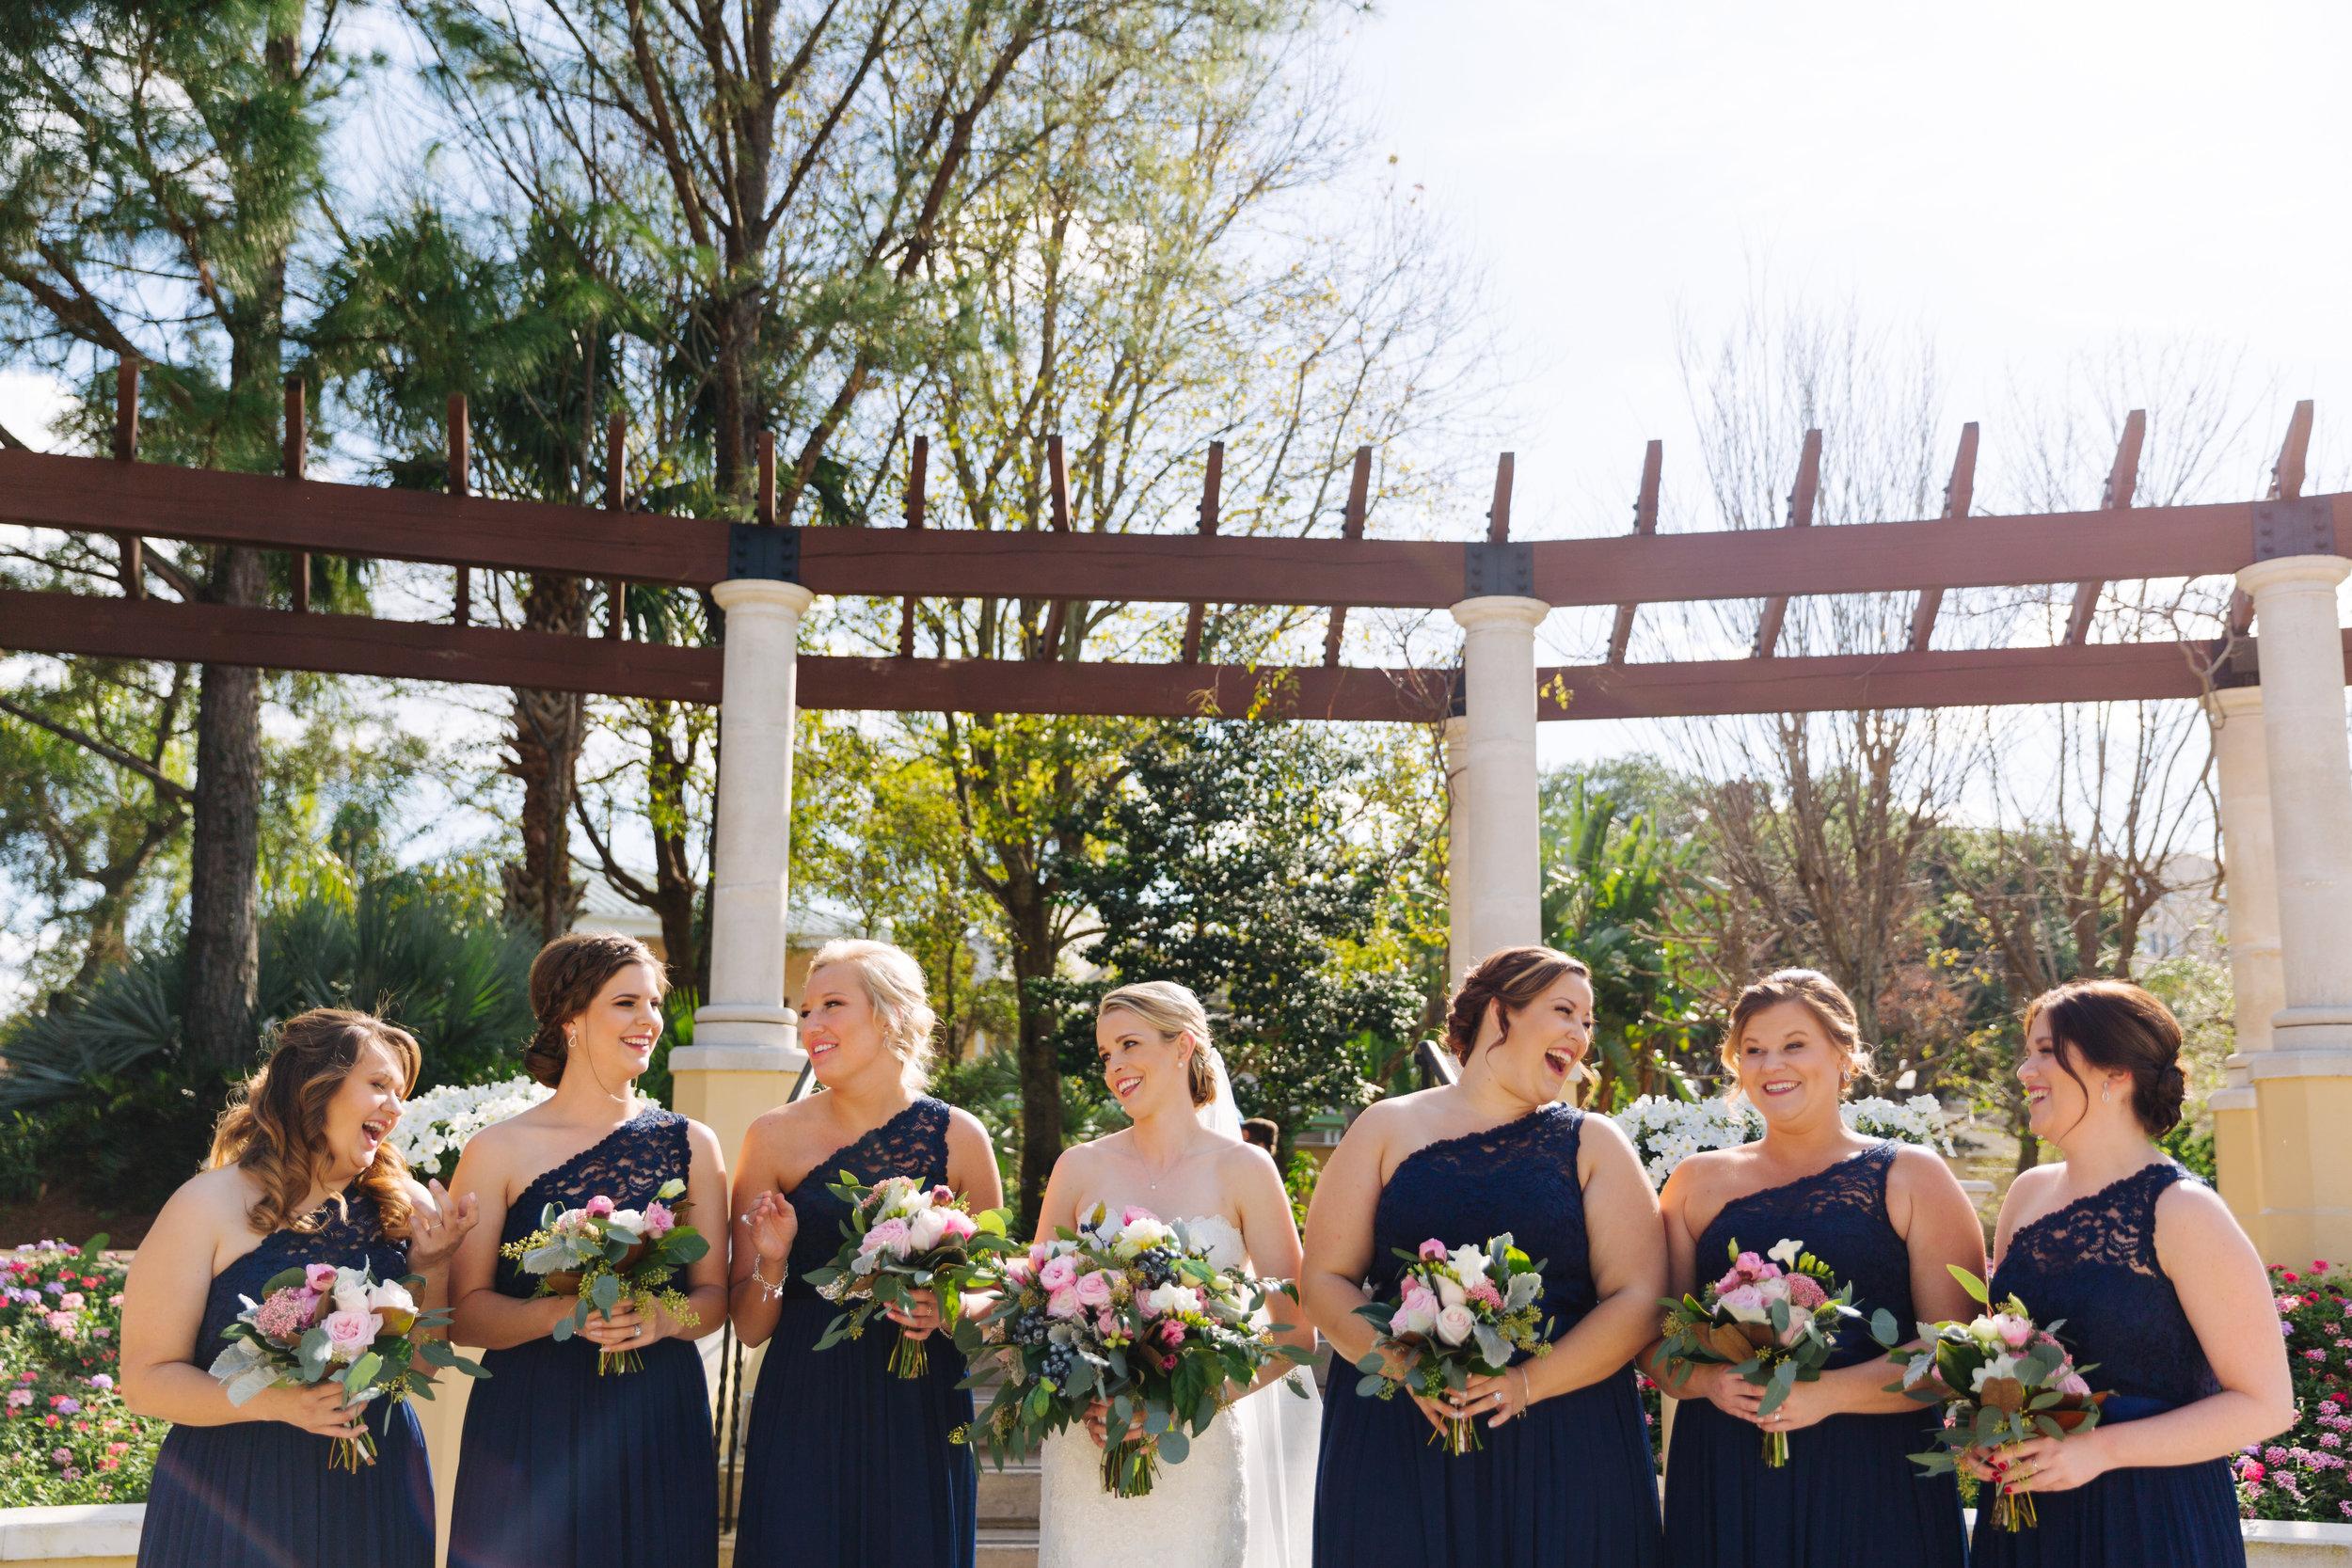 hollis gardens wedding downtown lakeland wedding jake and katie photography-15.jpg